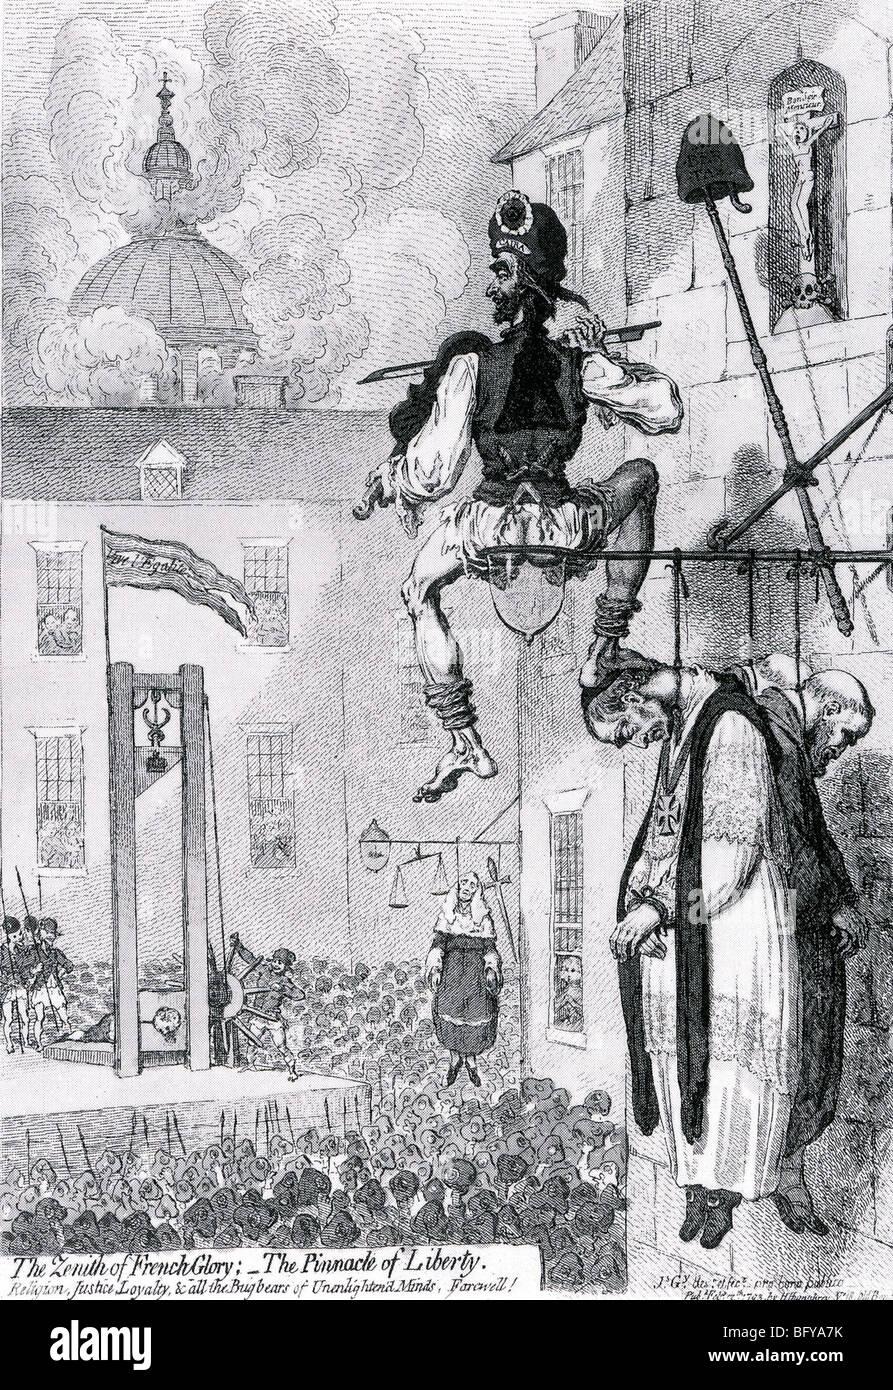 EXECUTION OF LOUIS XVI on 21 January 1793 as satirised by James Gilray - Stock Image